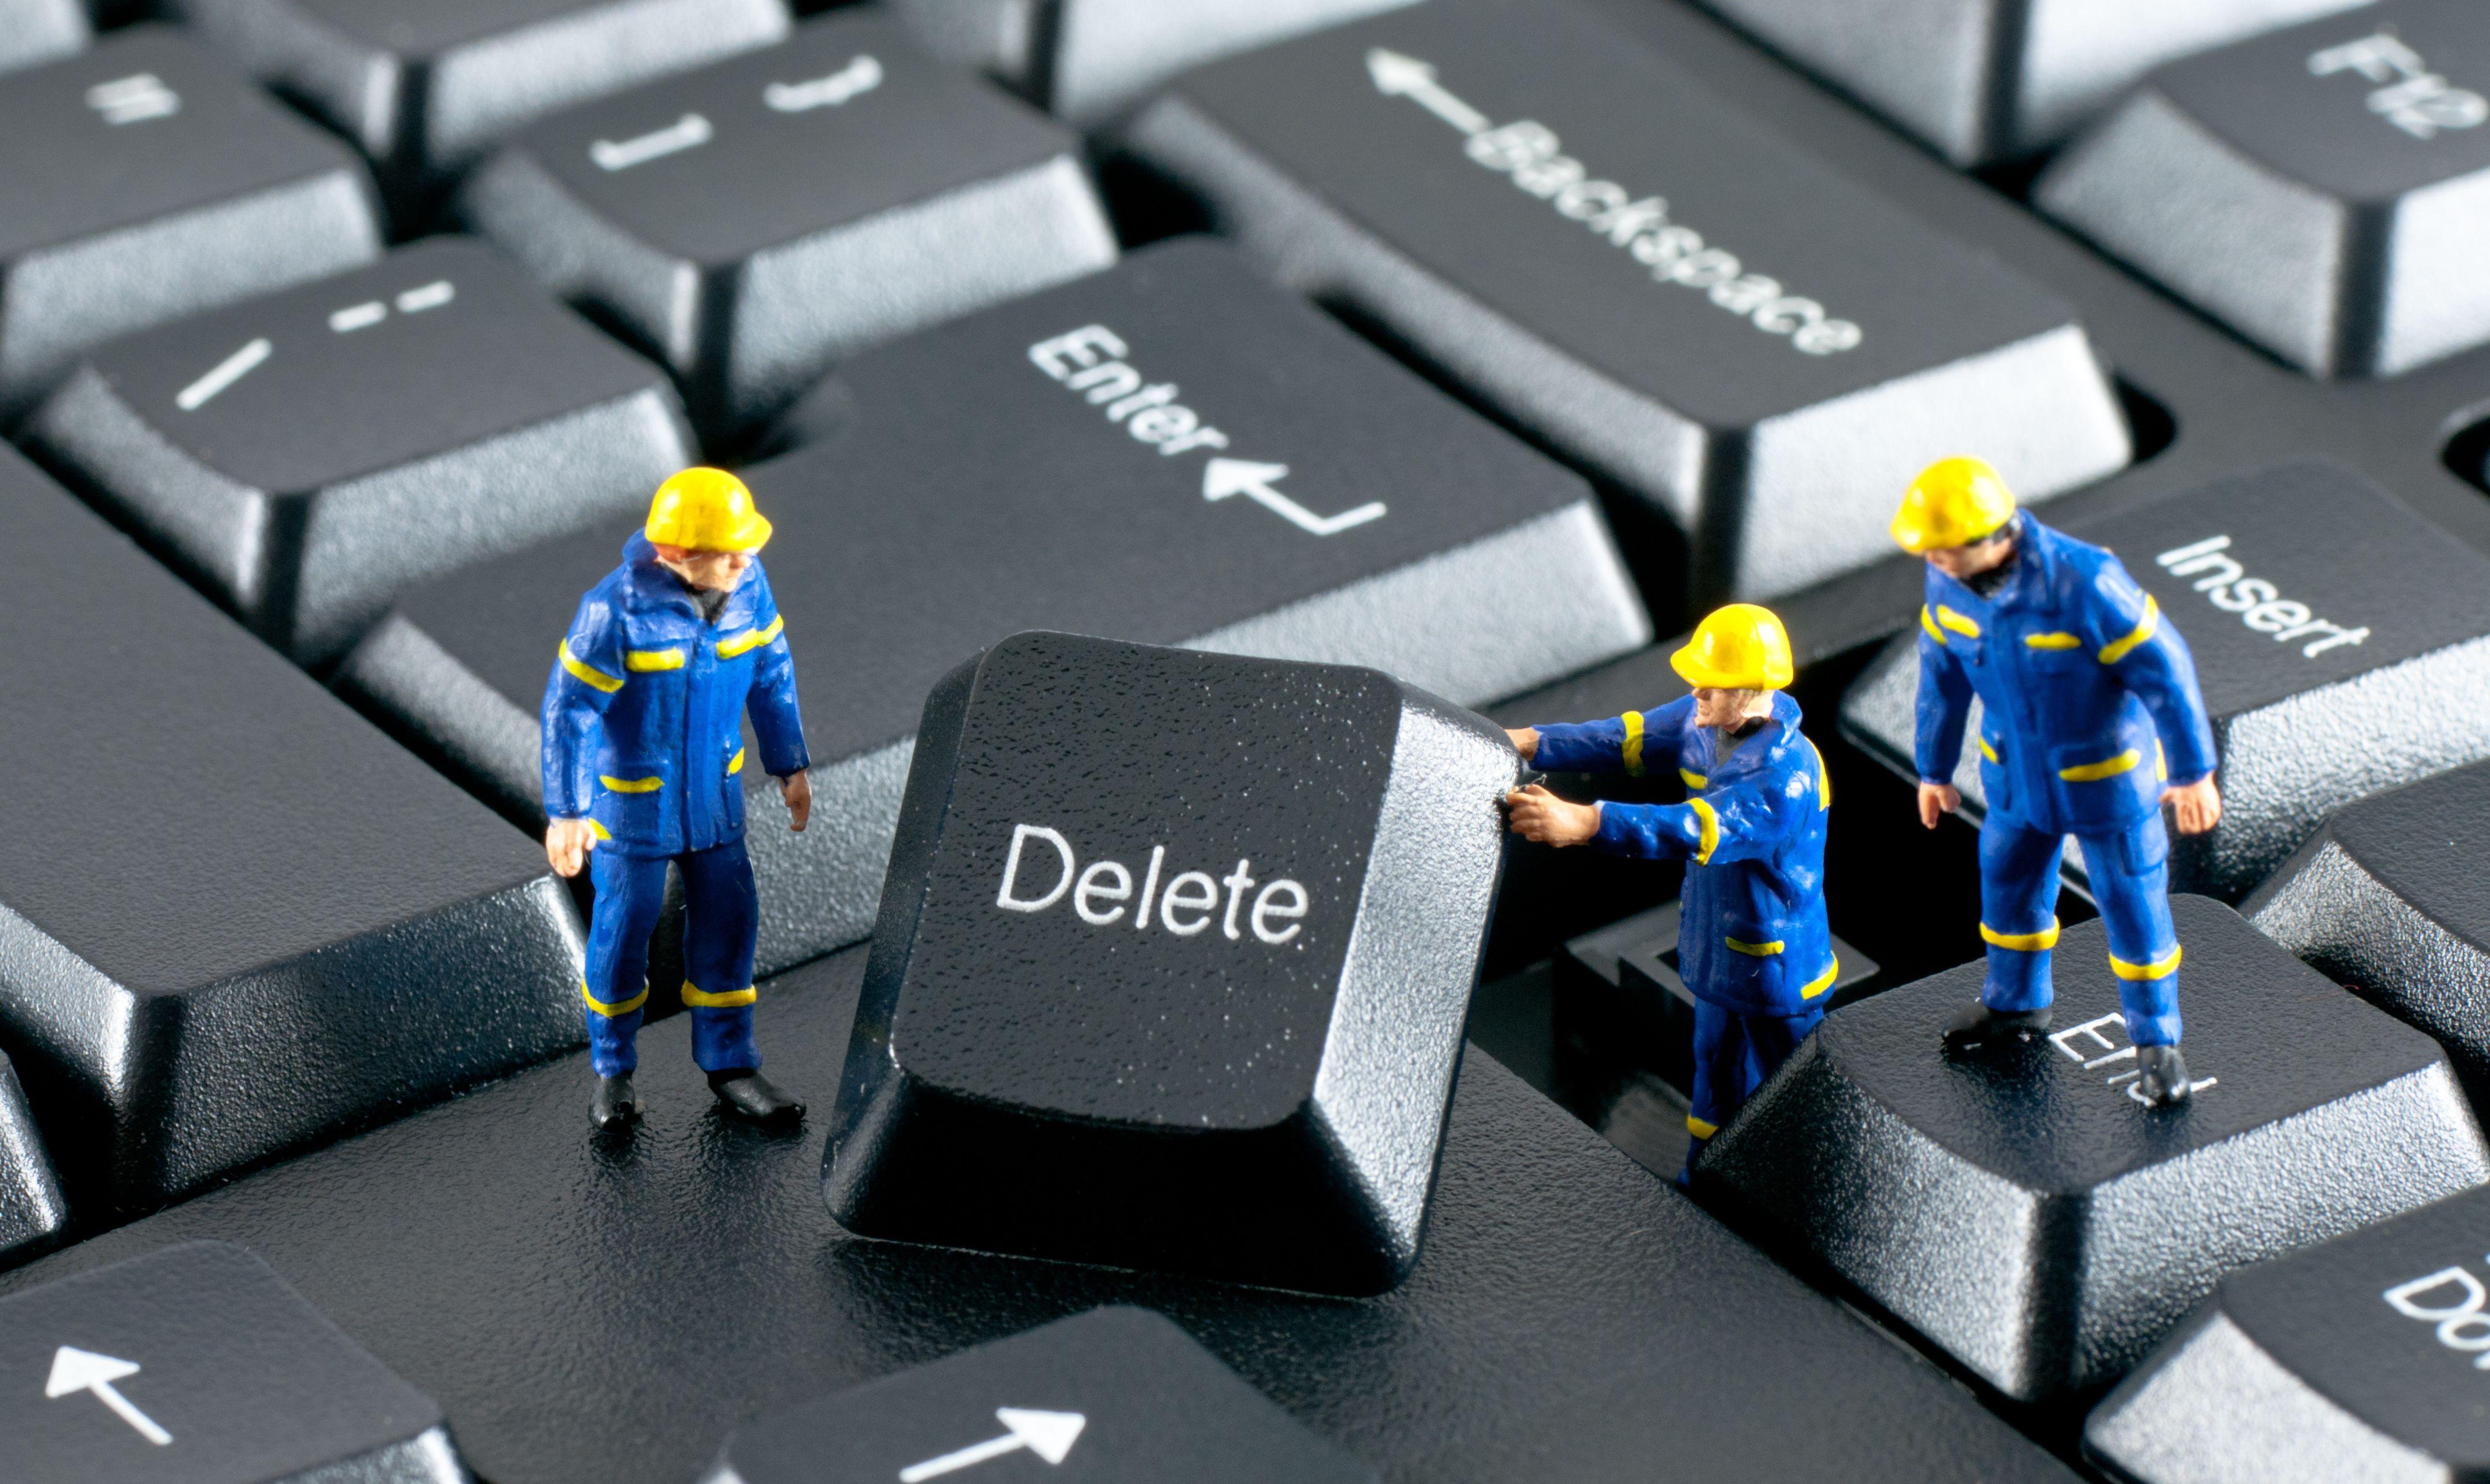 17 best ideas about Computer Repair Services on Pinterest ...